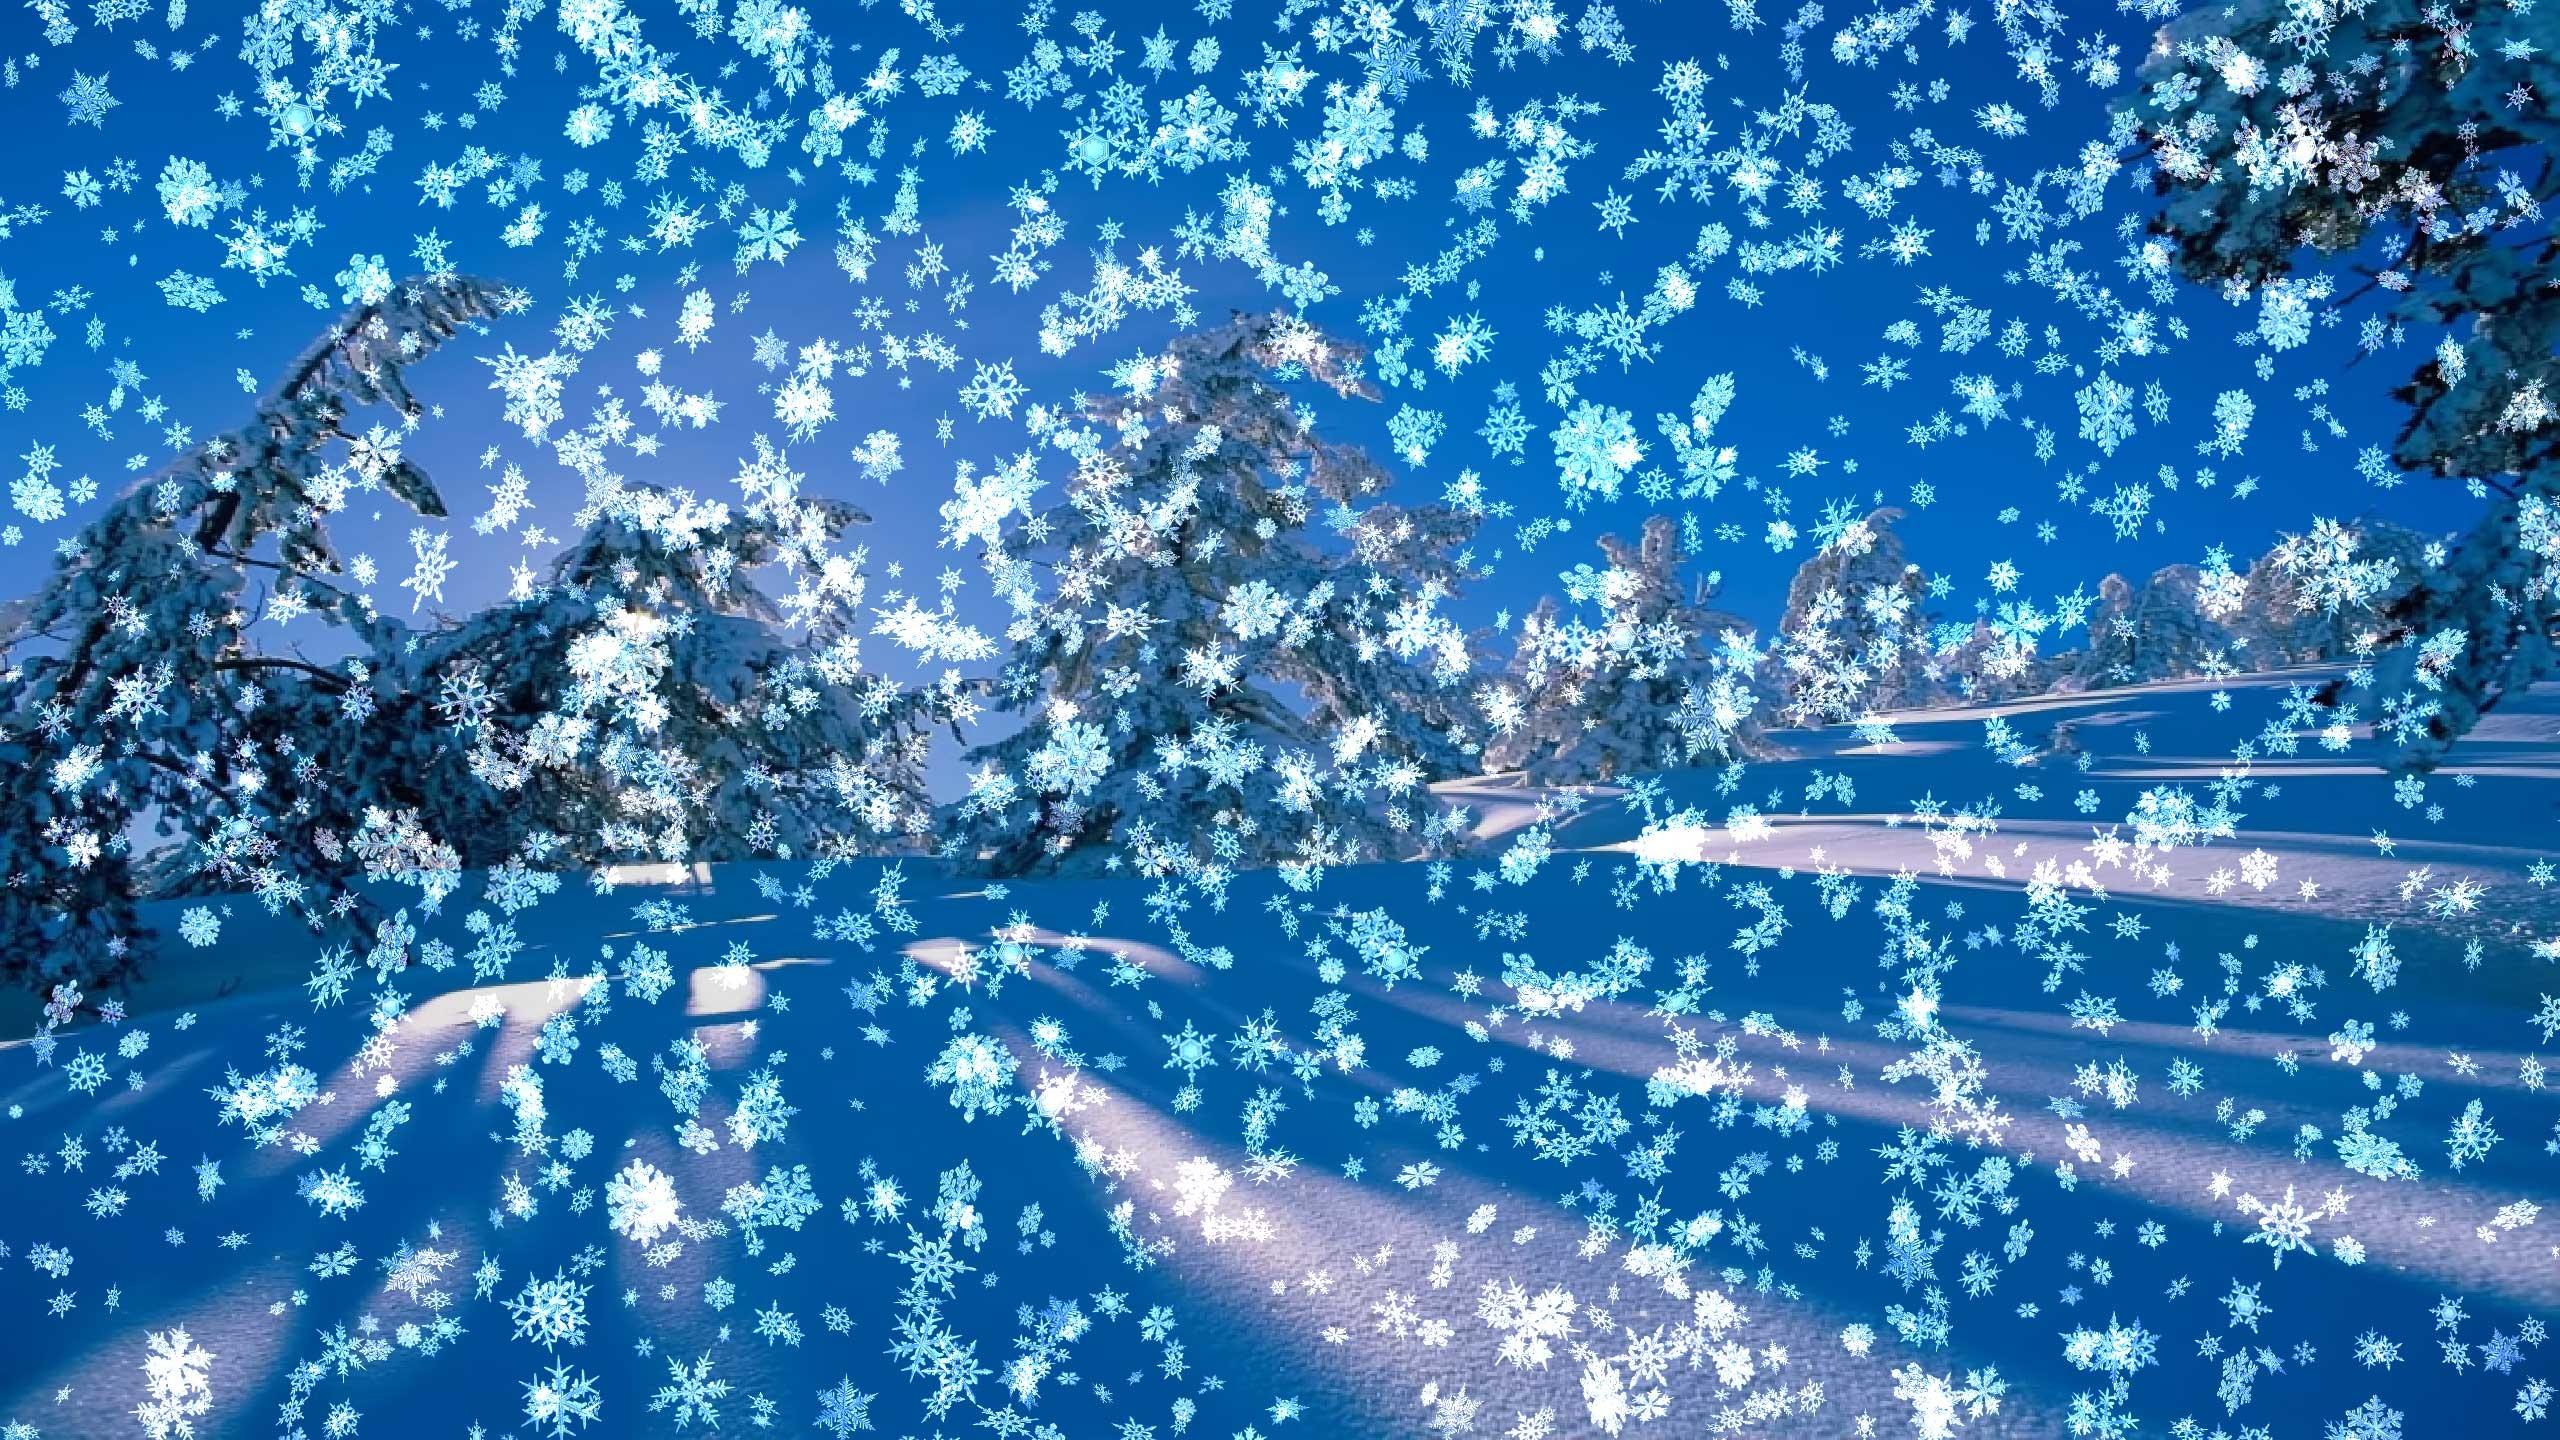 Res: 2560x1440, Snowy Desktop 3D